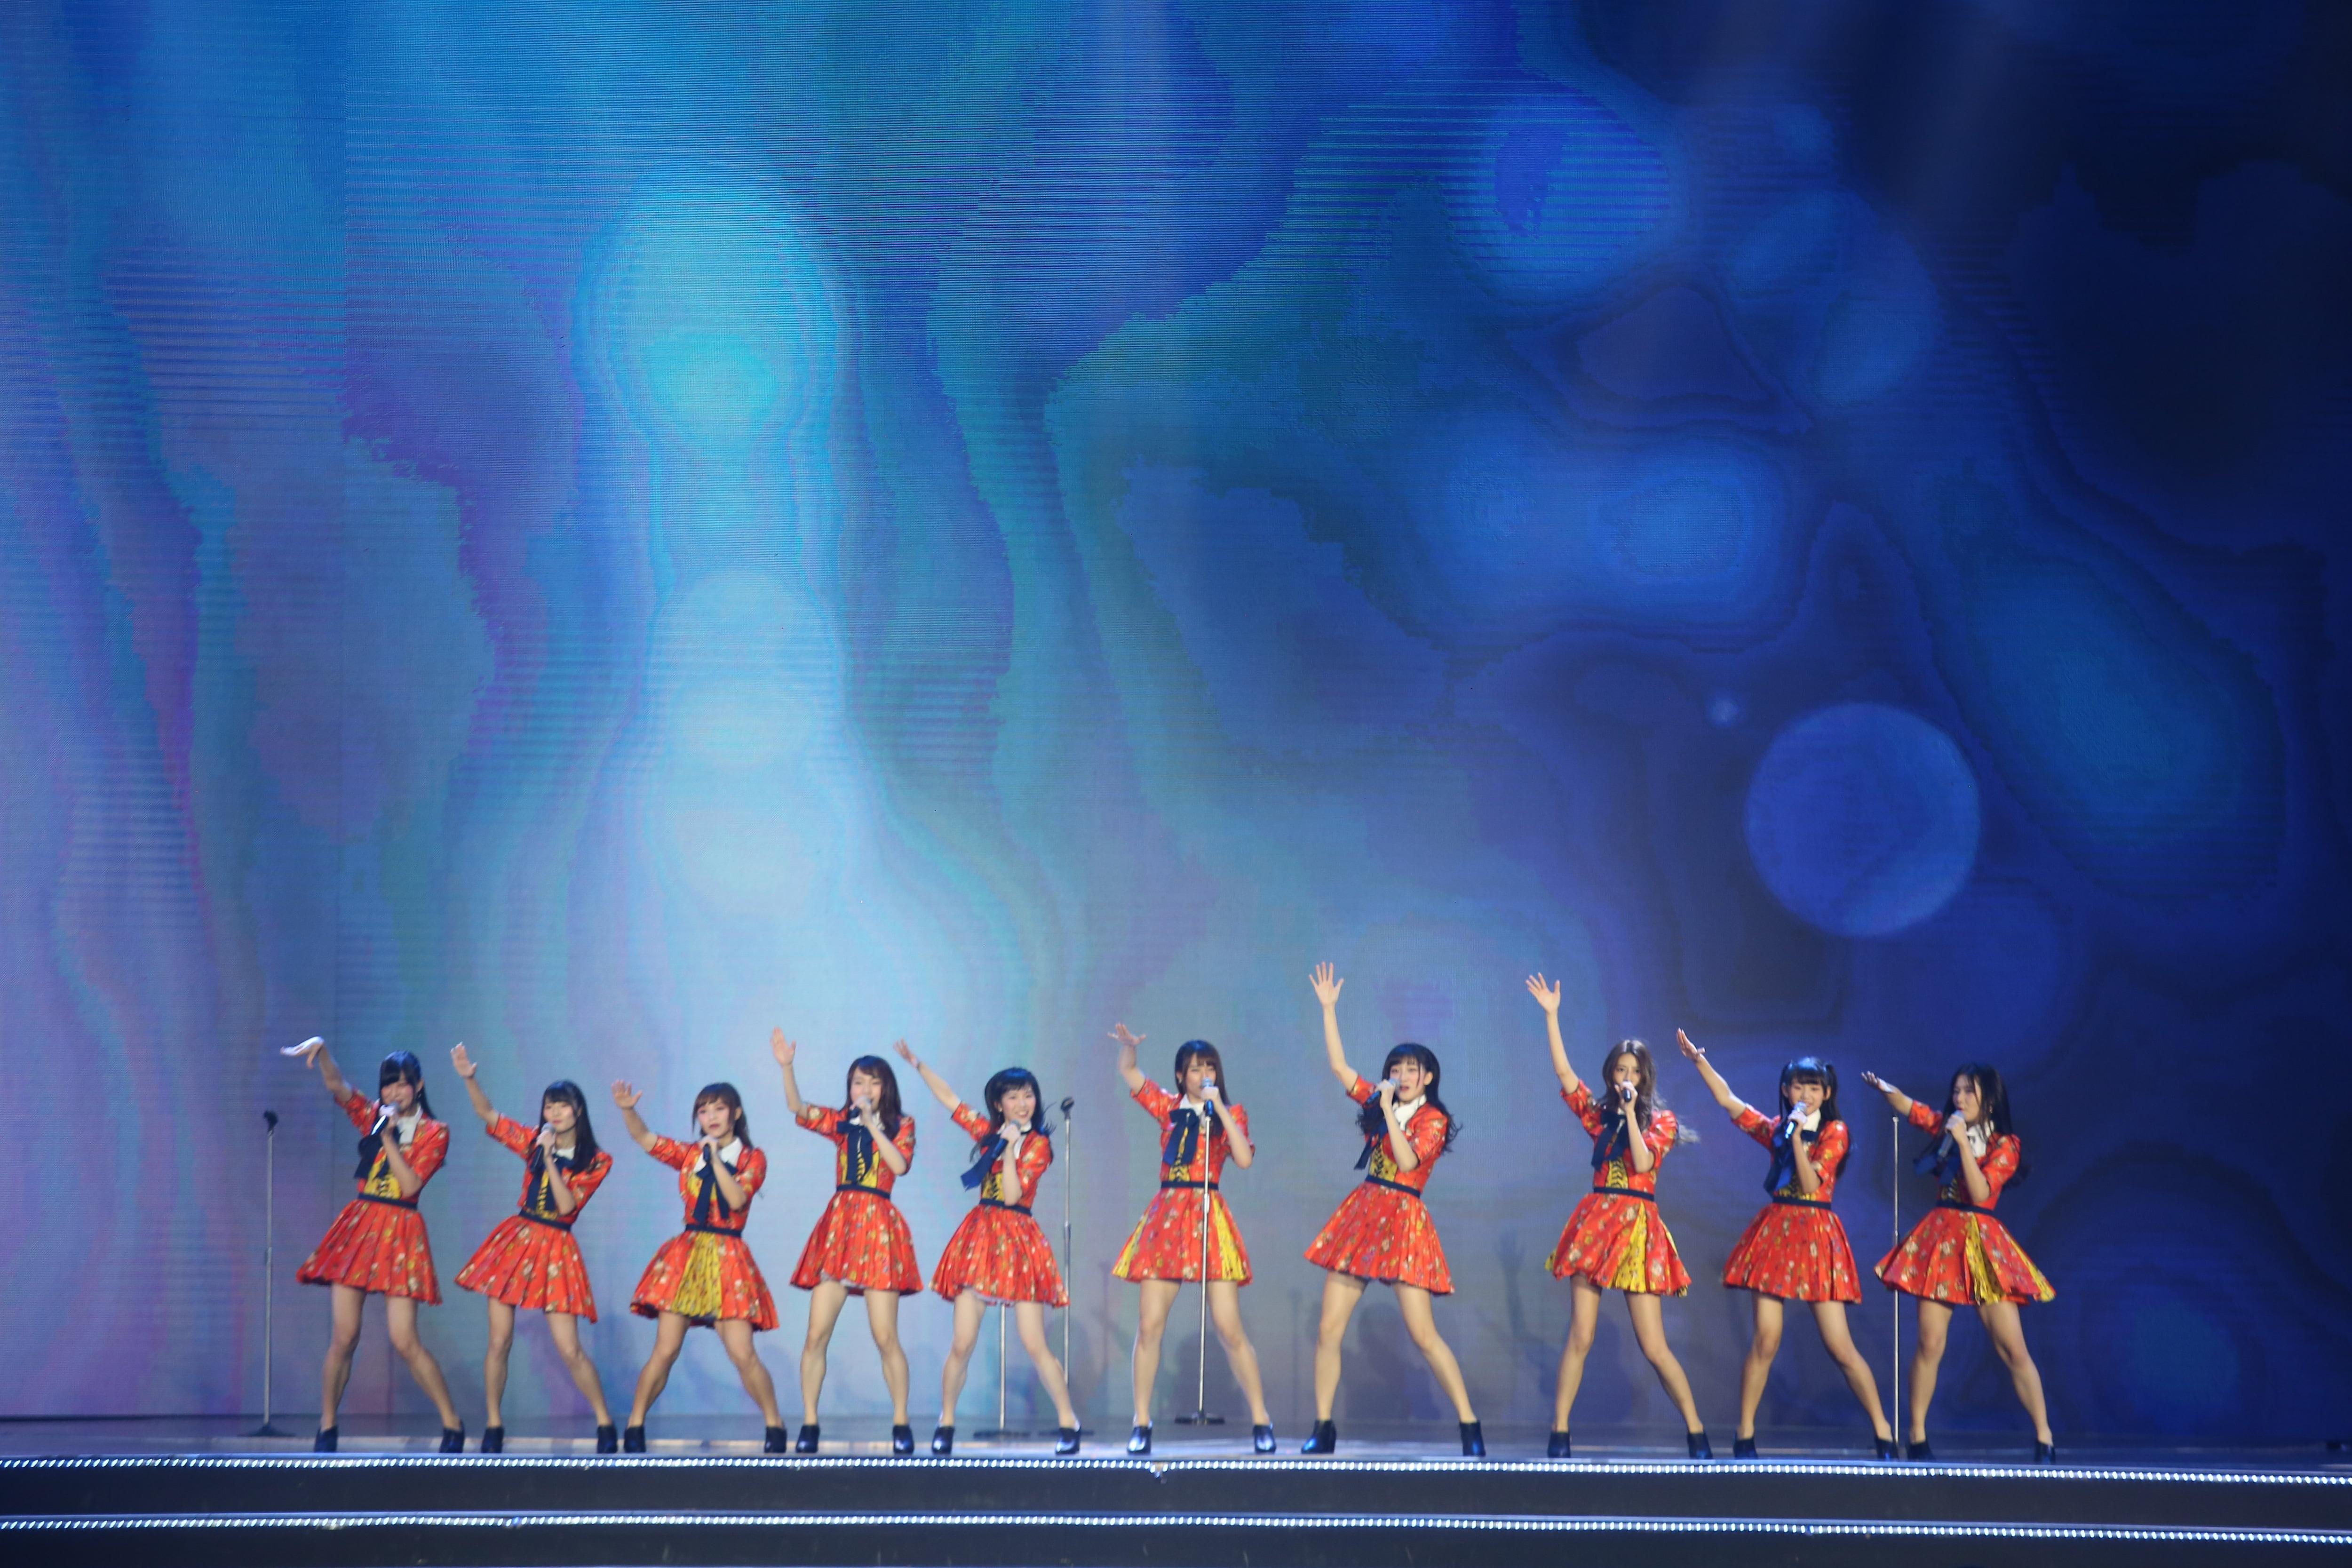 AKB48ほか、海外の姉妹グループが集結し『恋するフォーチュンクッキー』を熱唱!【写真23枚】の画像004